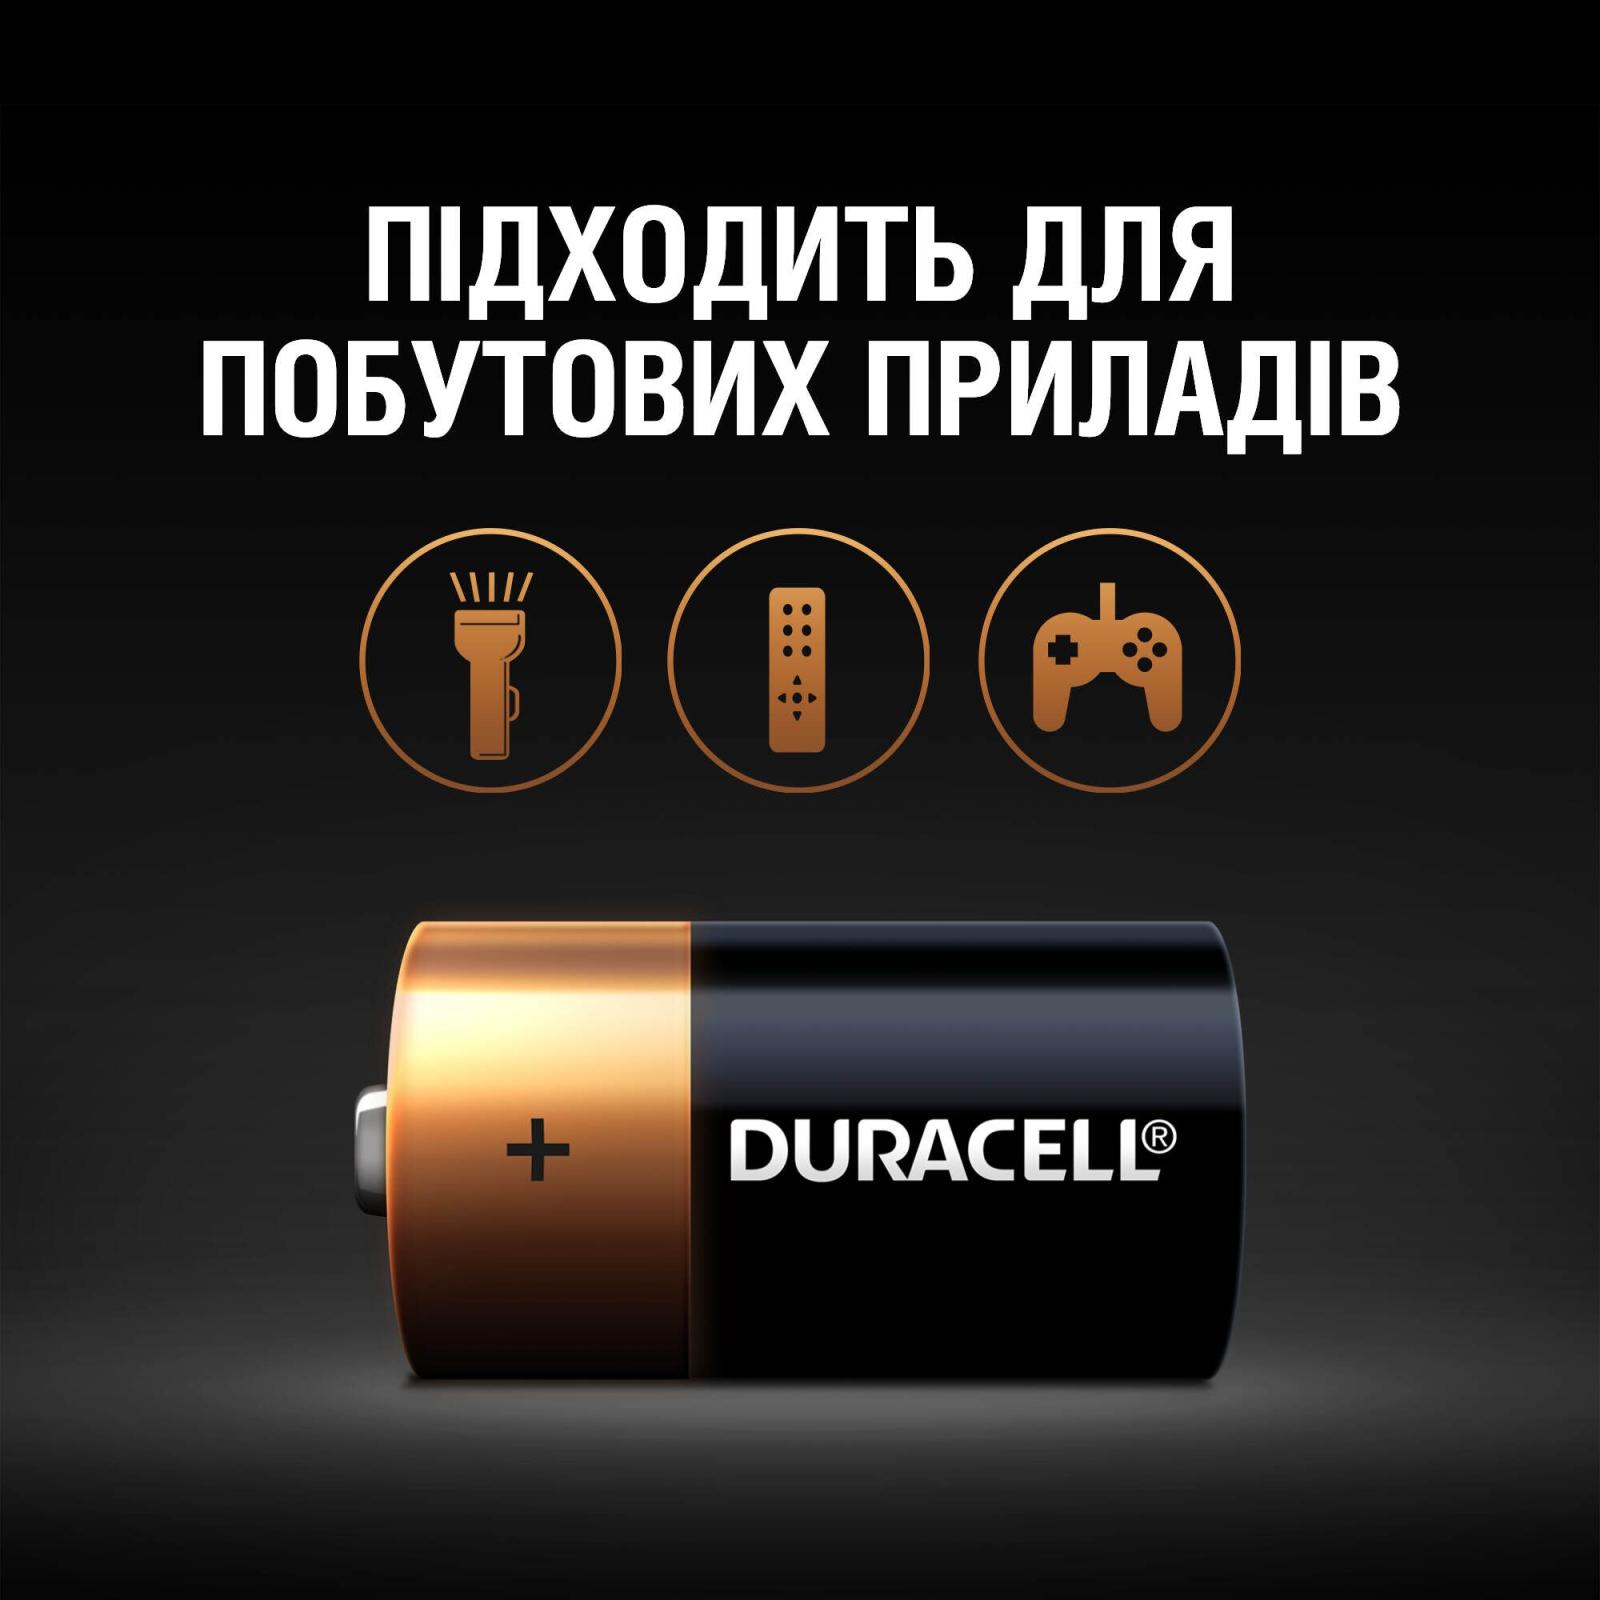 Батарейка C LR14 * 2 Duracell (5000394052529 / 81483545) изображение 5